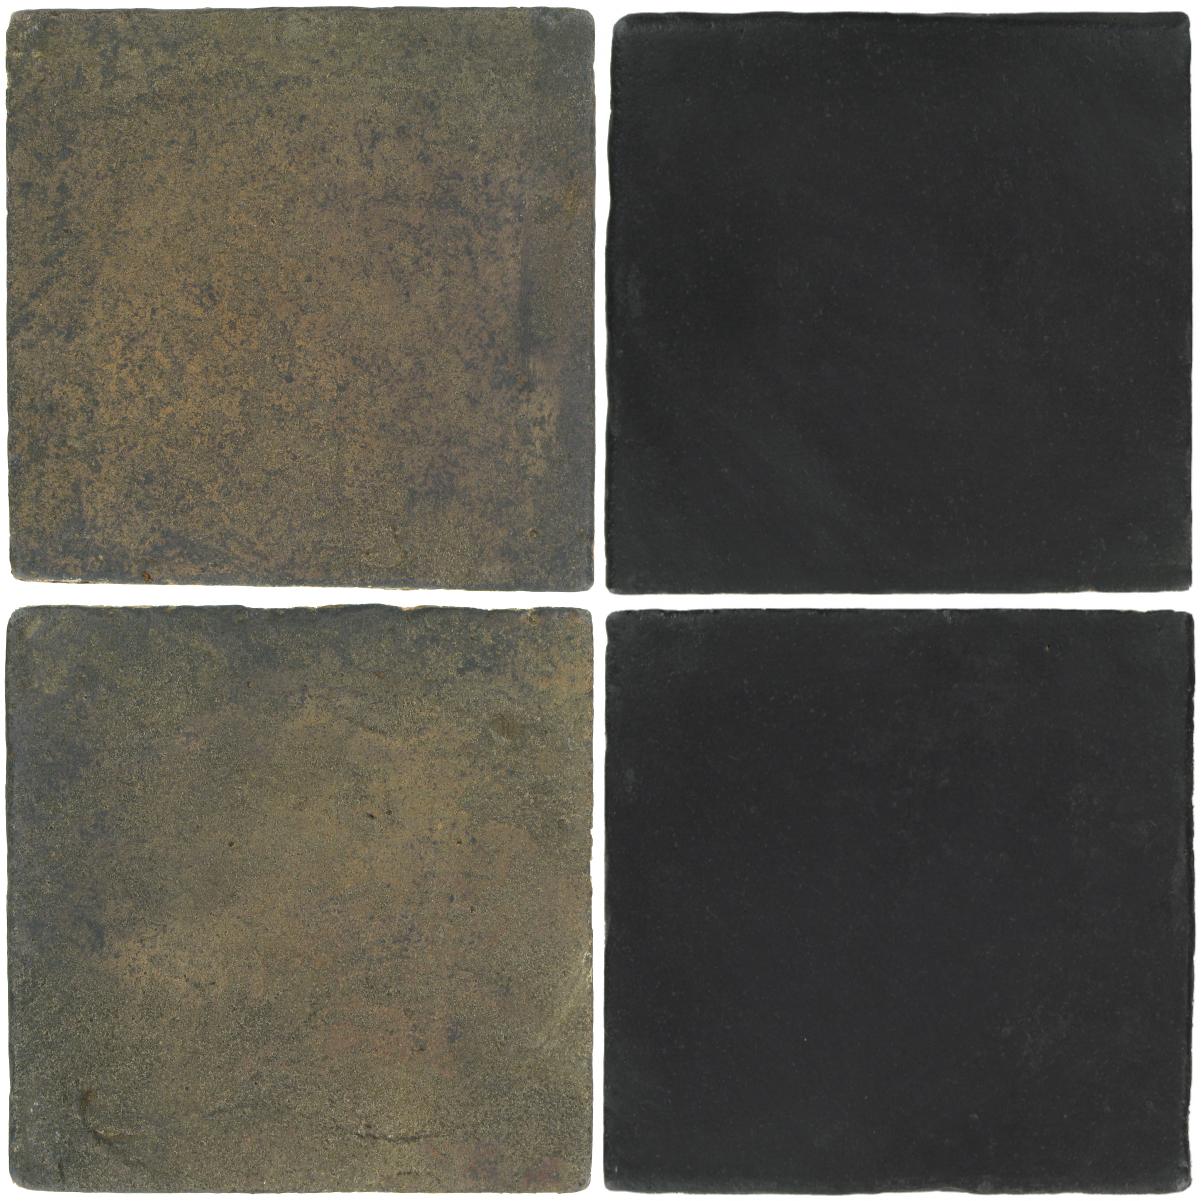 Pedralbes Antique Terracotta  2 Color Combinations  VTG-PSTG Terra Grey + OHS-PGCB Carbon Black